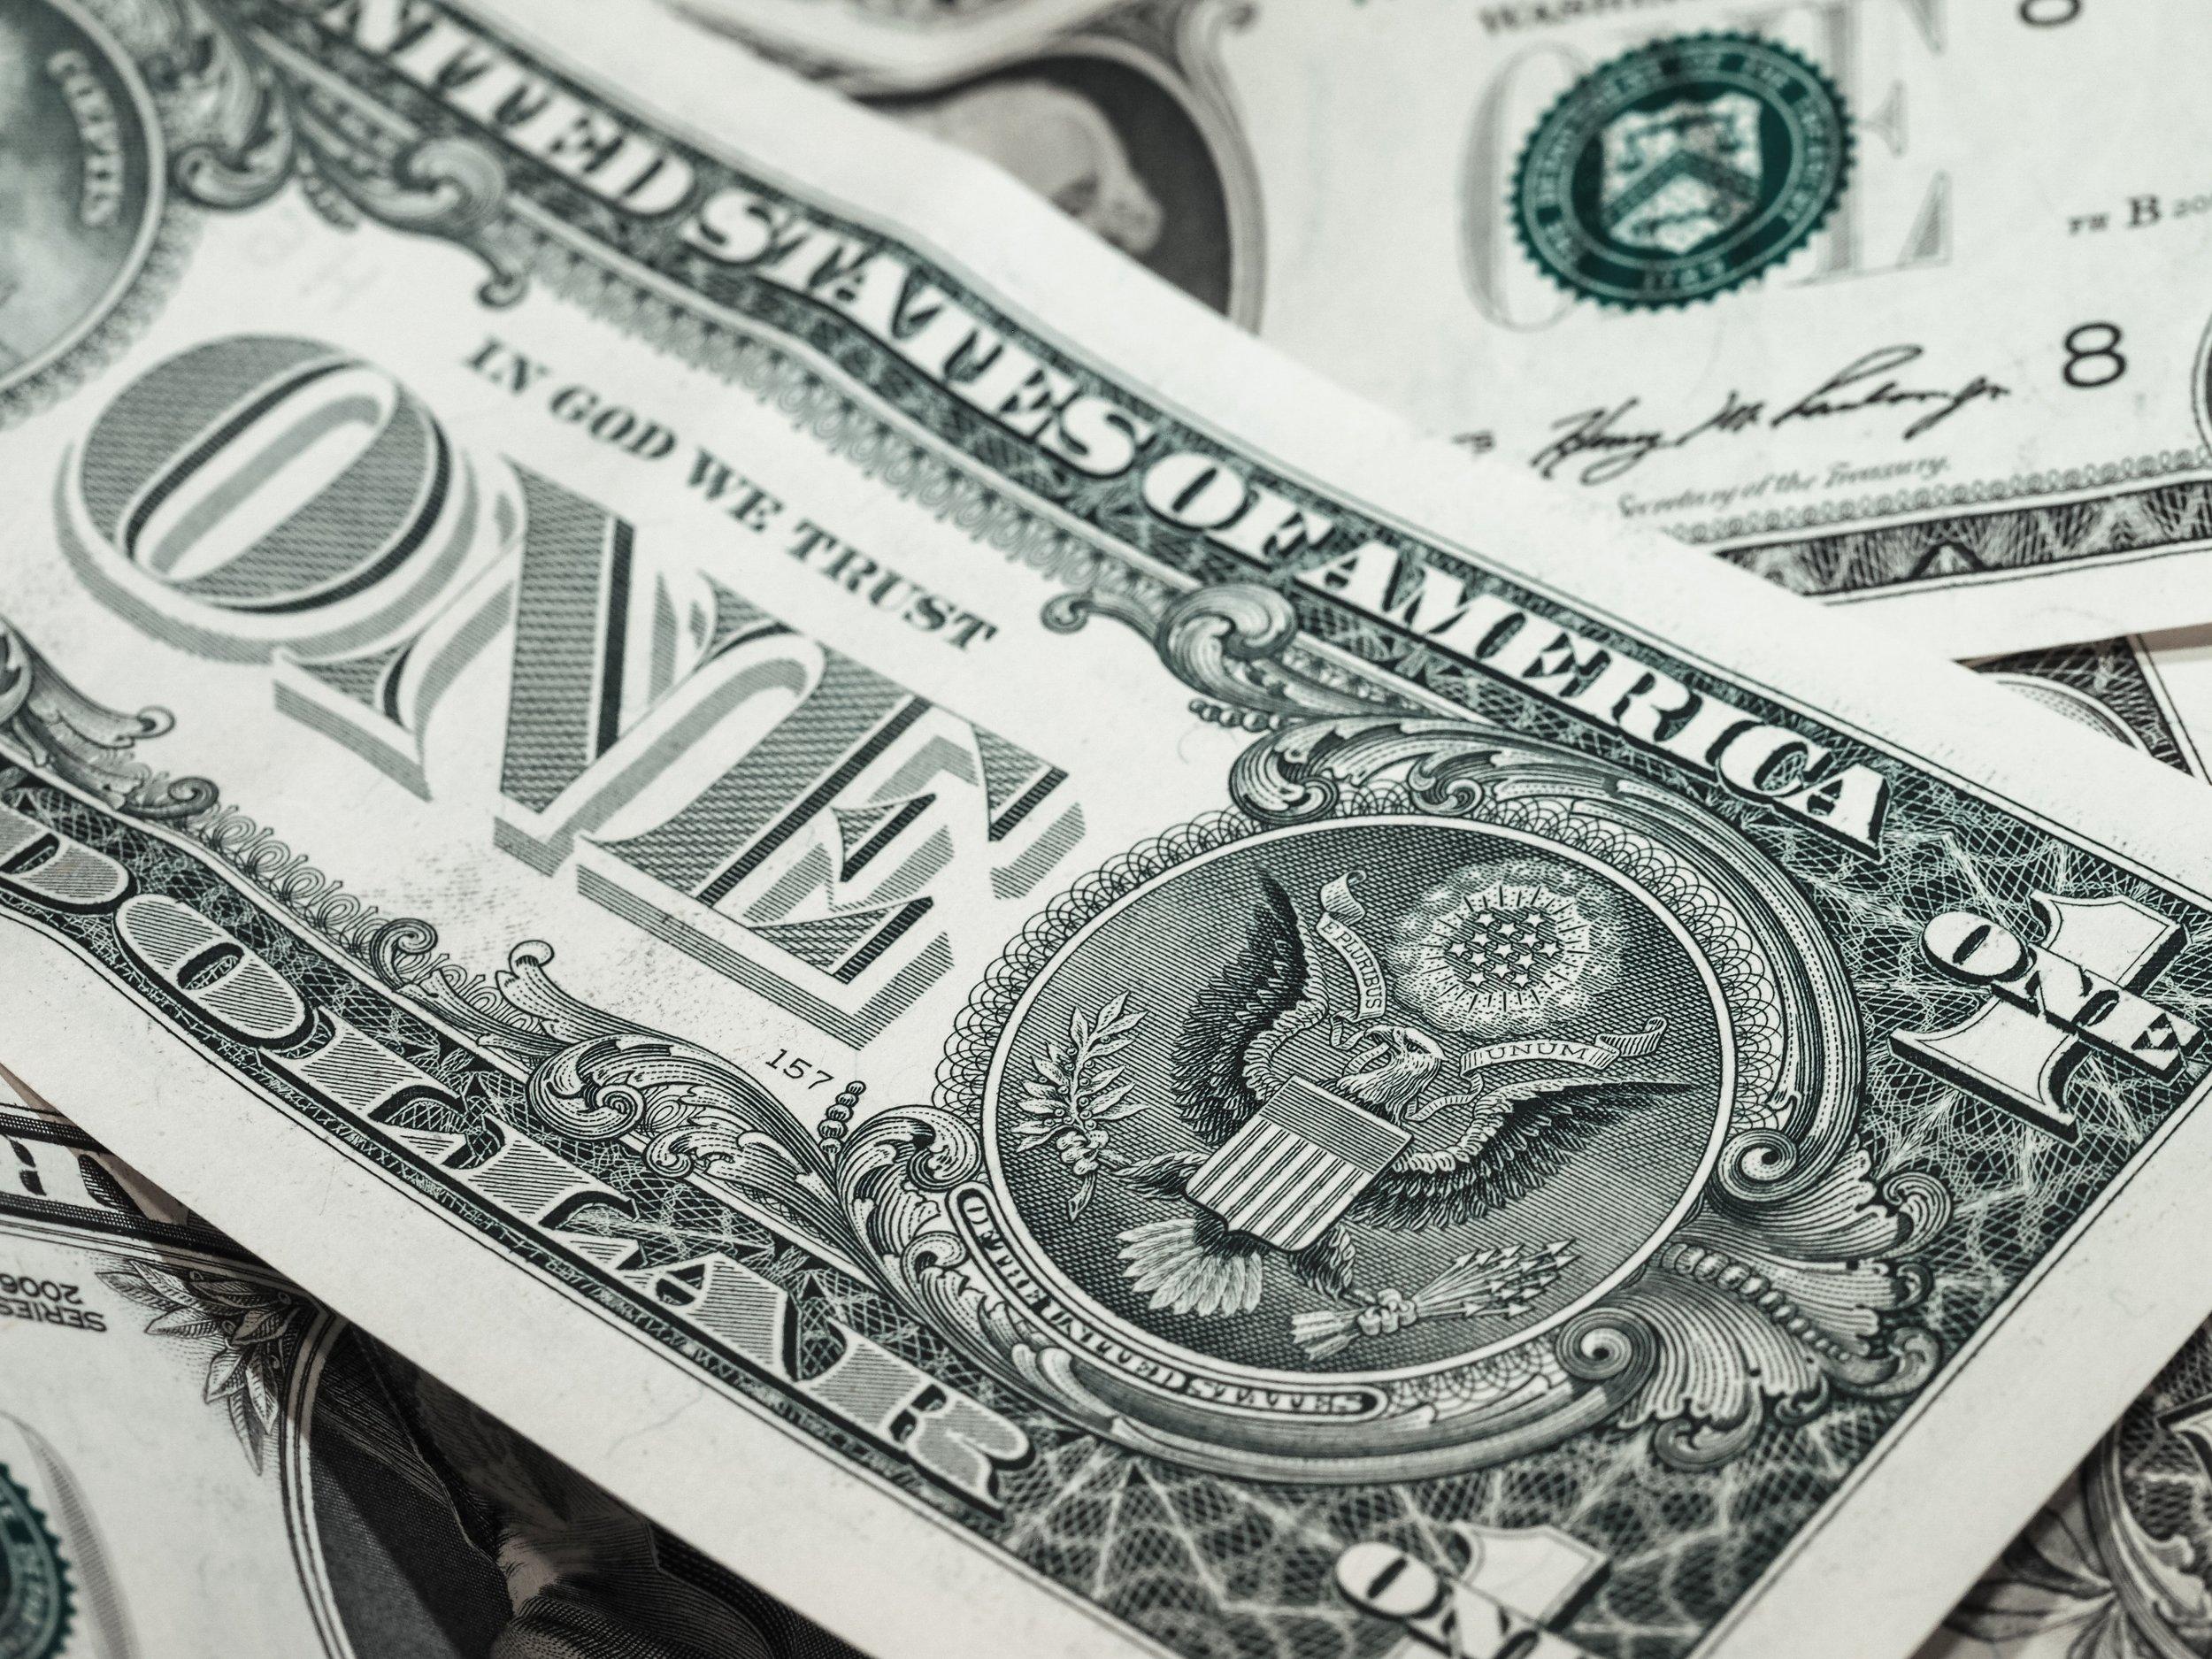 budget-cash-currency-164661.jpg